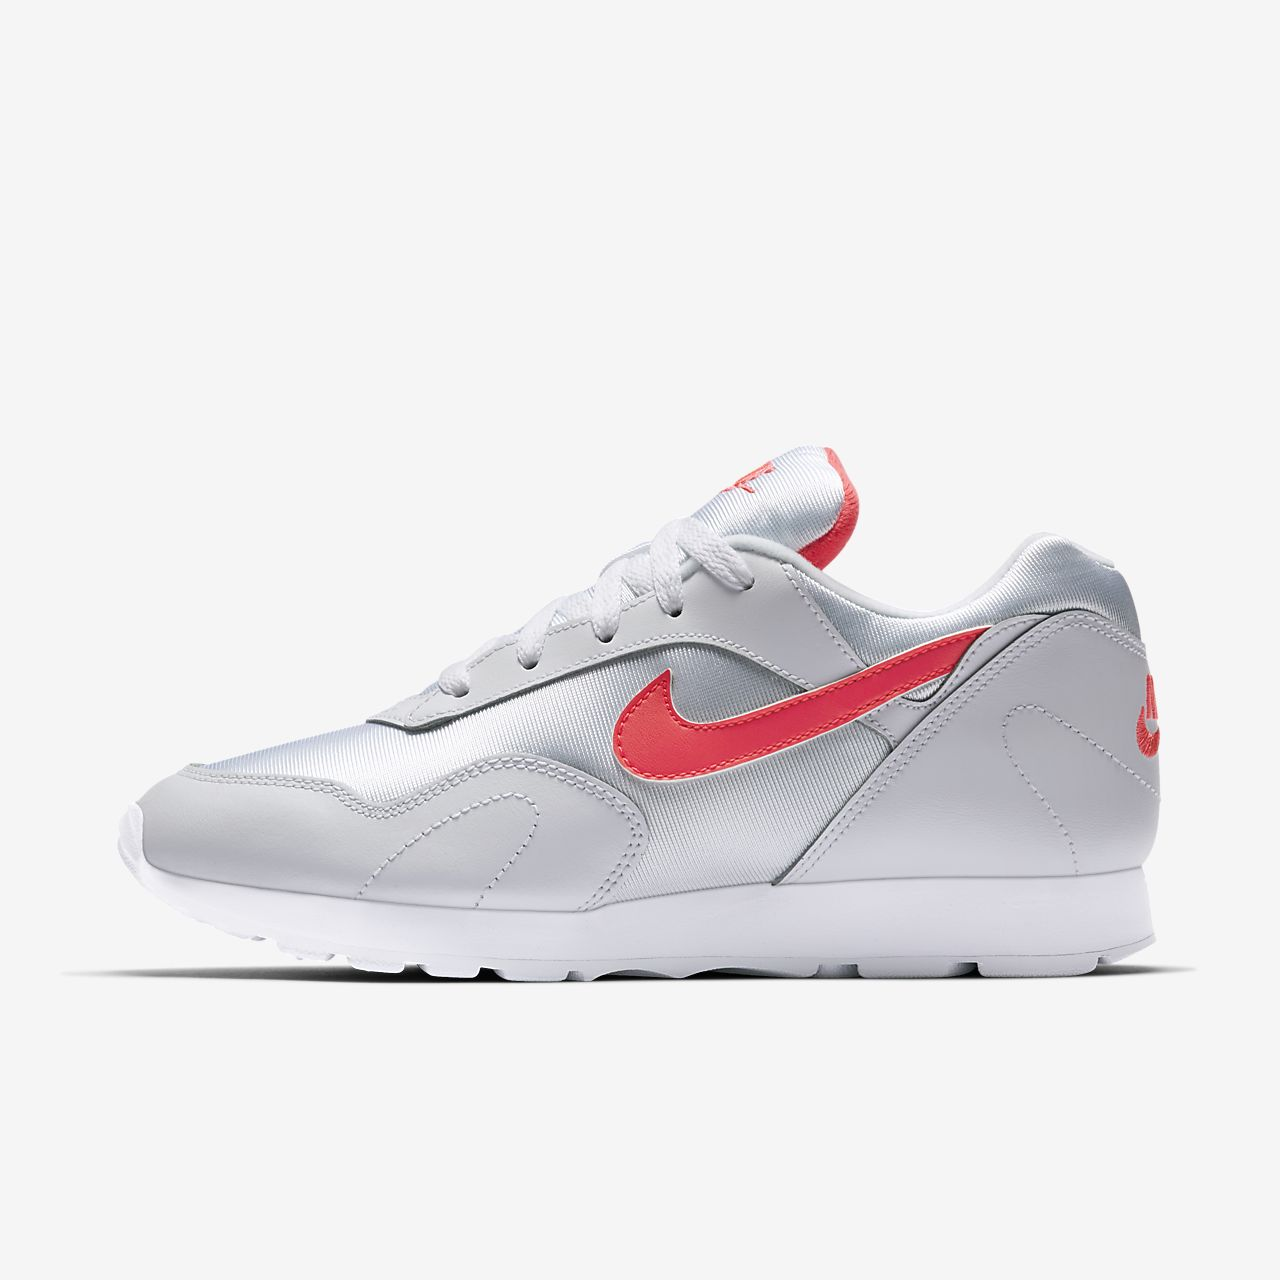 watch 1d50e e10f0 ... Nike Outburst OG Womens Shoe